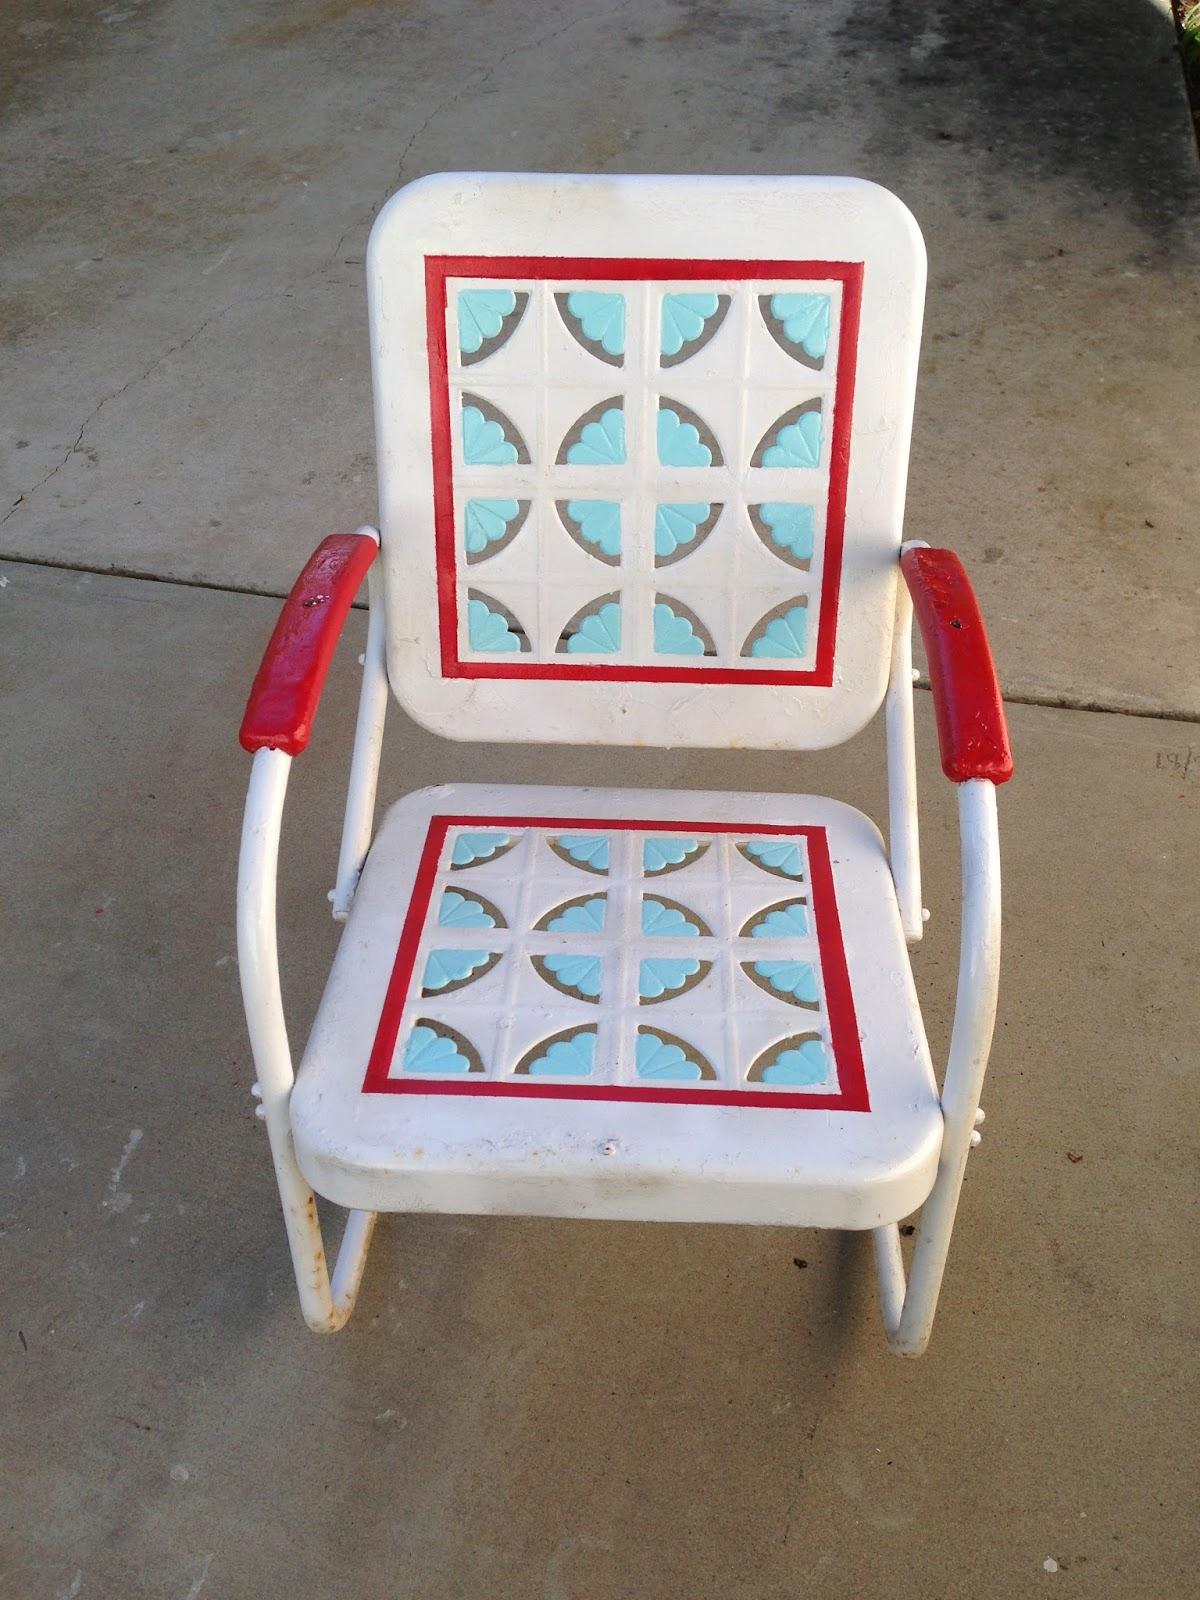 Cherry Picked Vintage Motel Chair Transformation Score